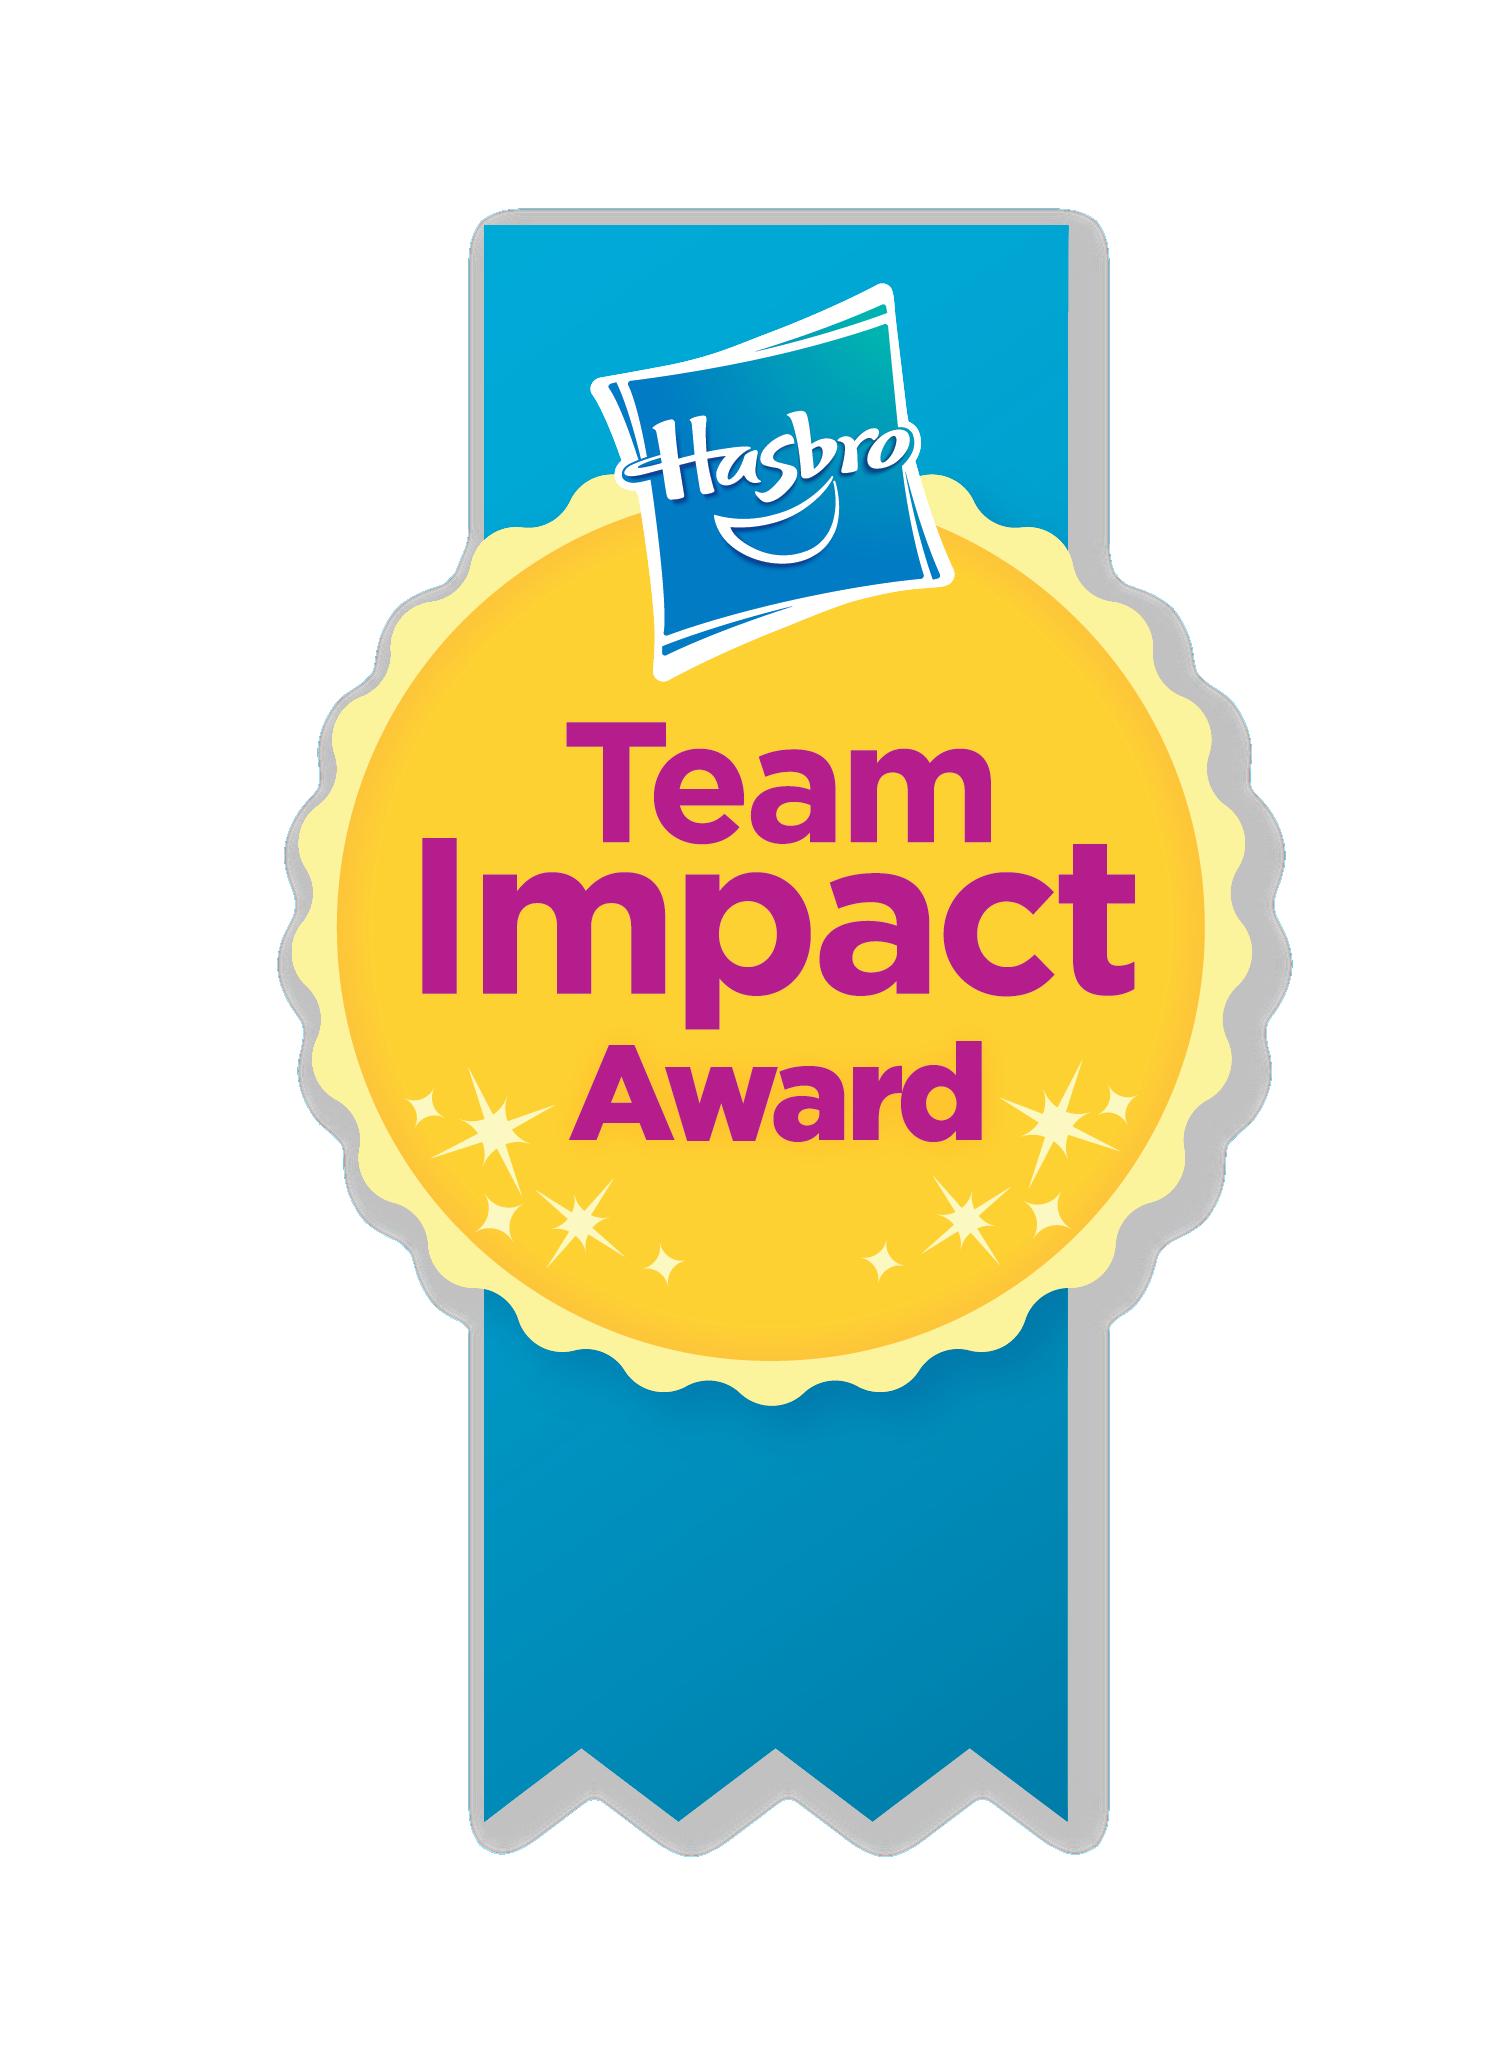 HasbroTeam Impact Award